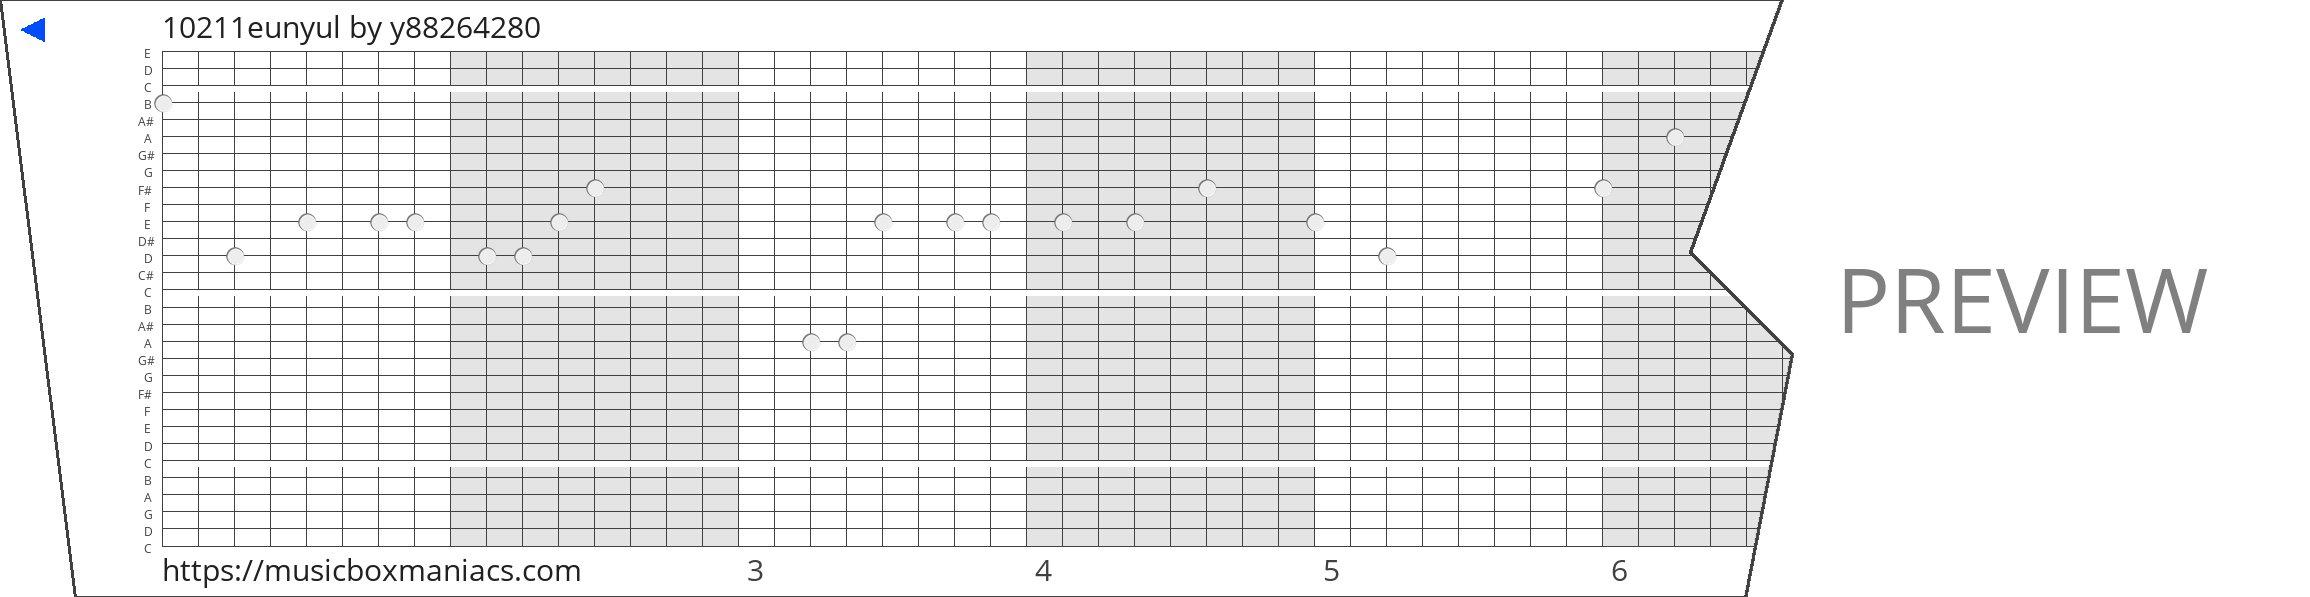 10211eunyul 30 note music box paper strip